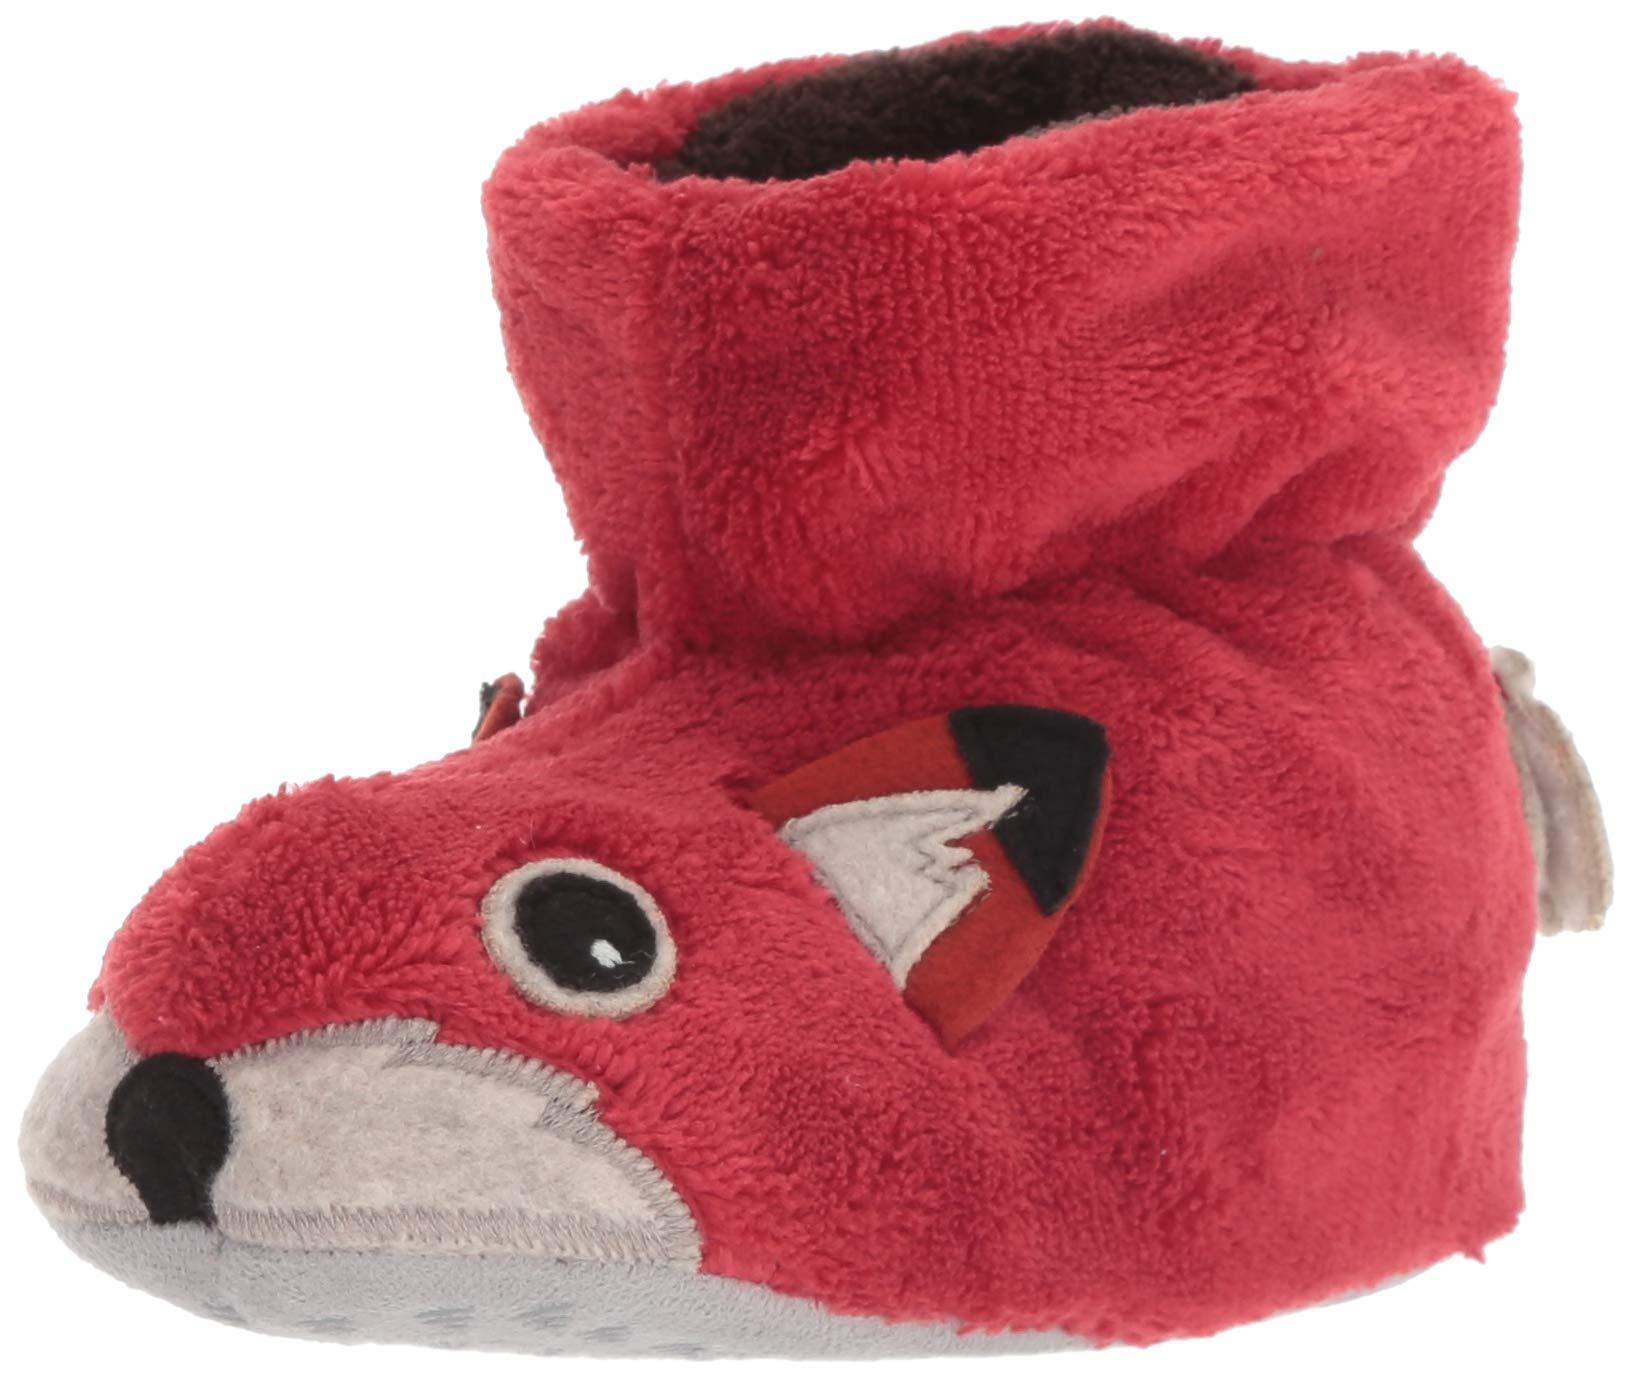 ACORN Baby Easy Critter Kids Bootie Slipper, XL, Red Fox by Acorn